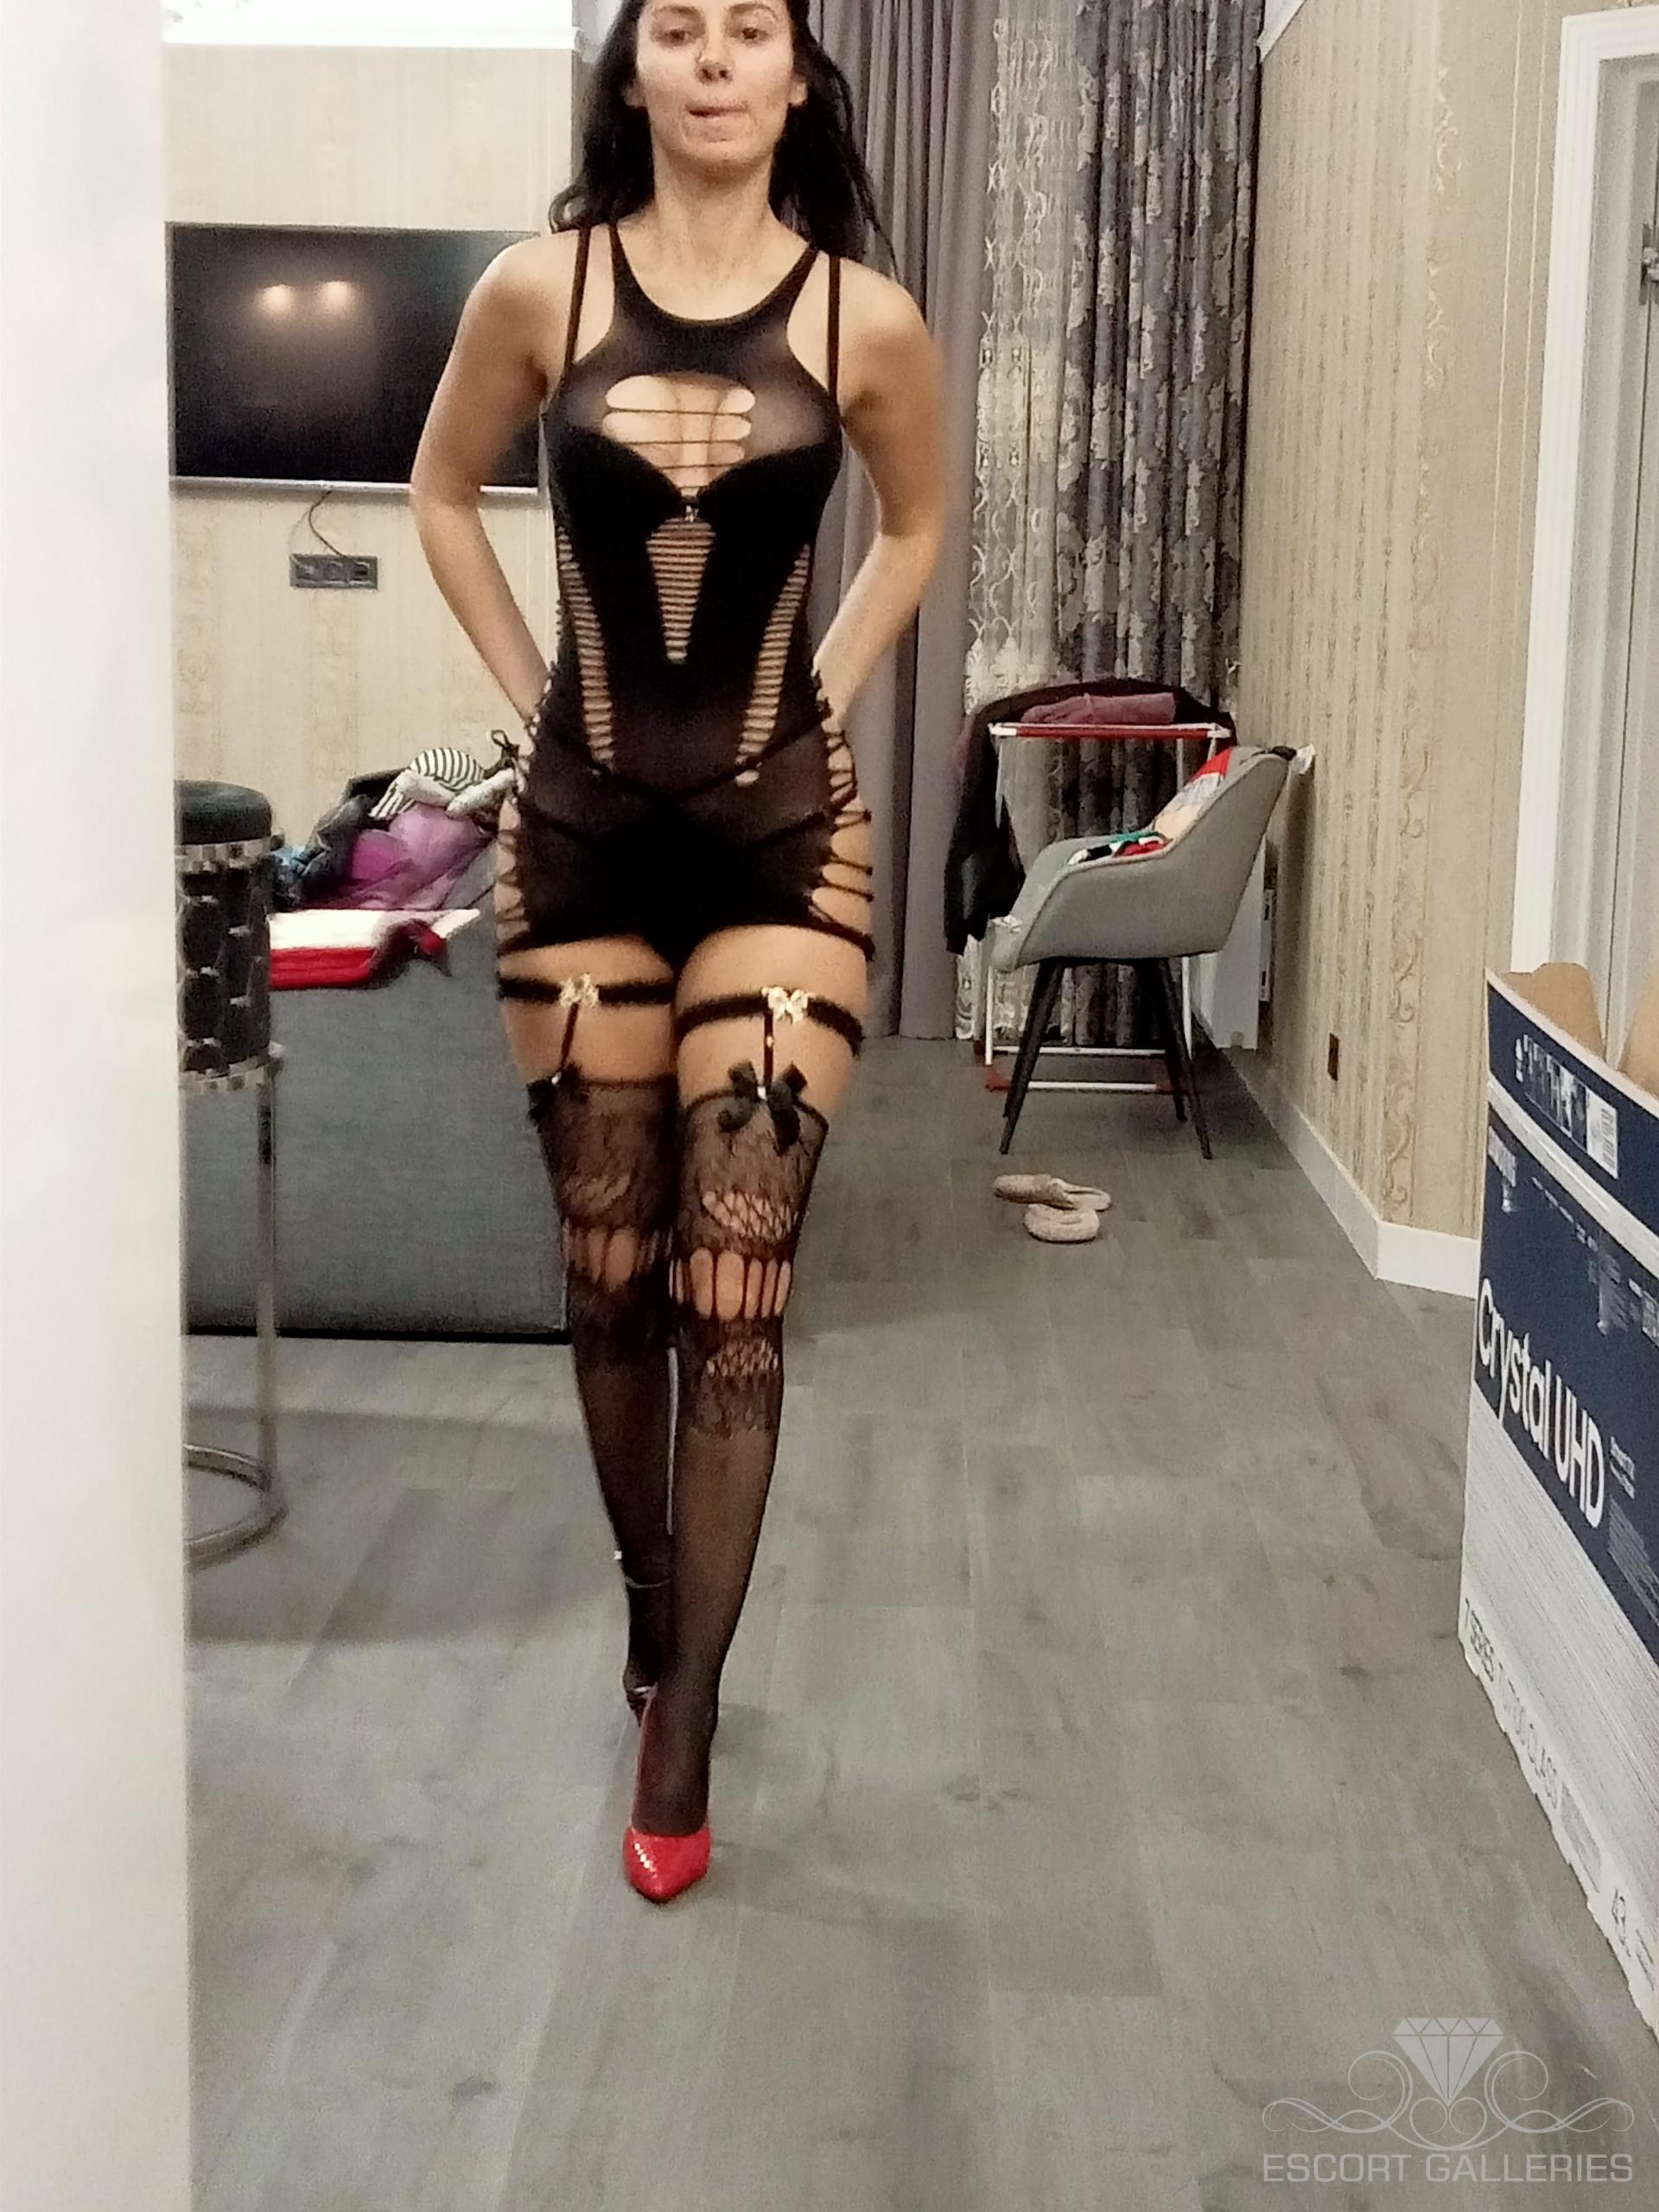 canarias escort dolg sex